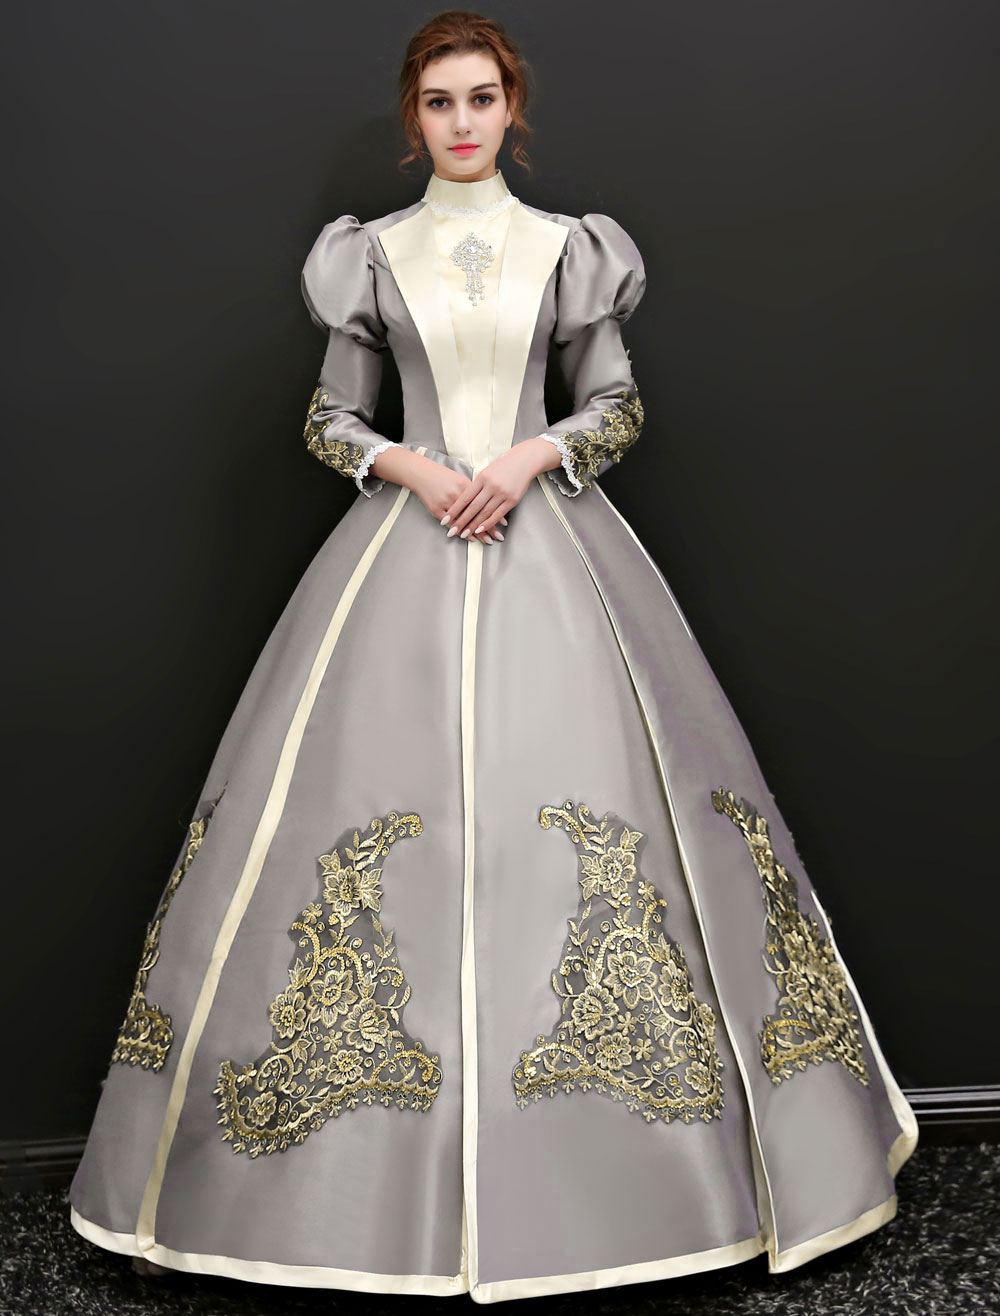 Victorian era clothing for women